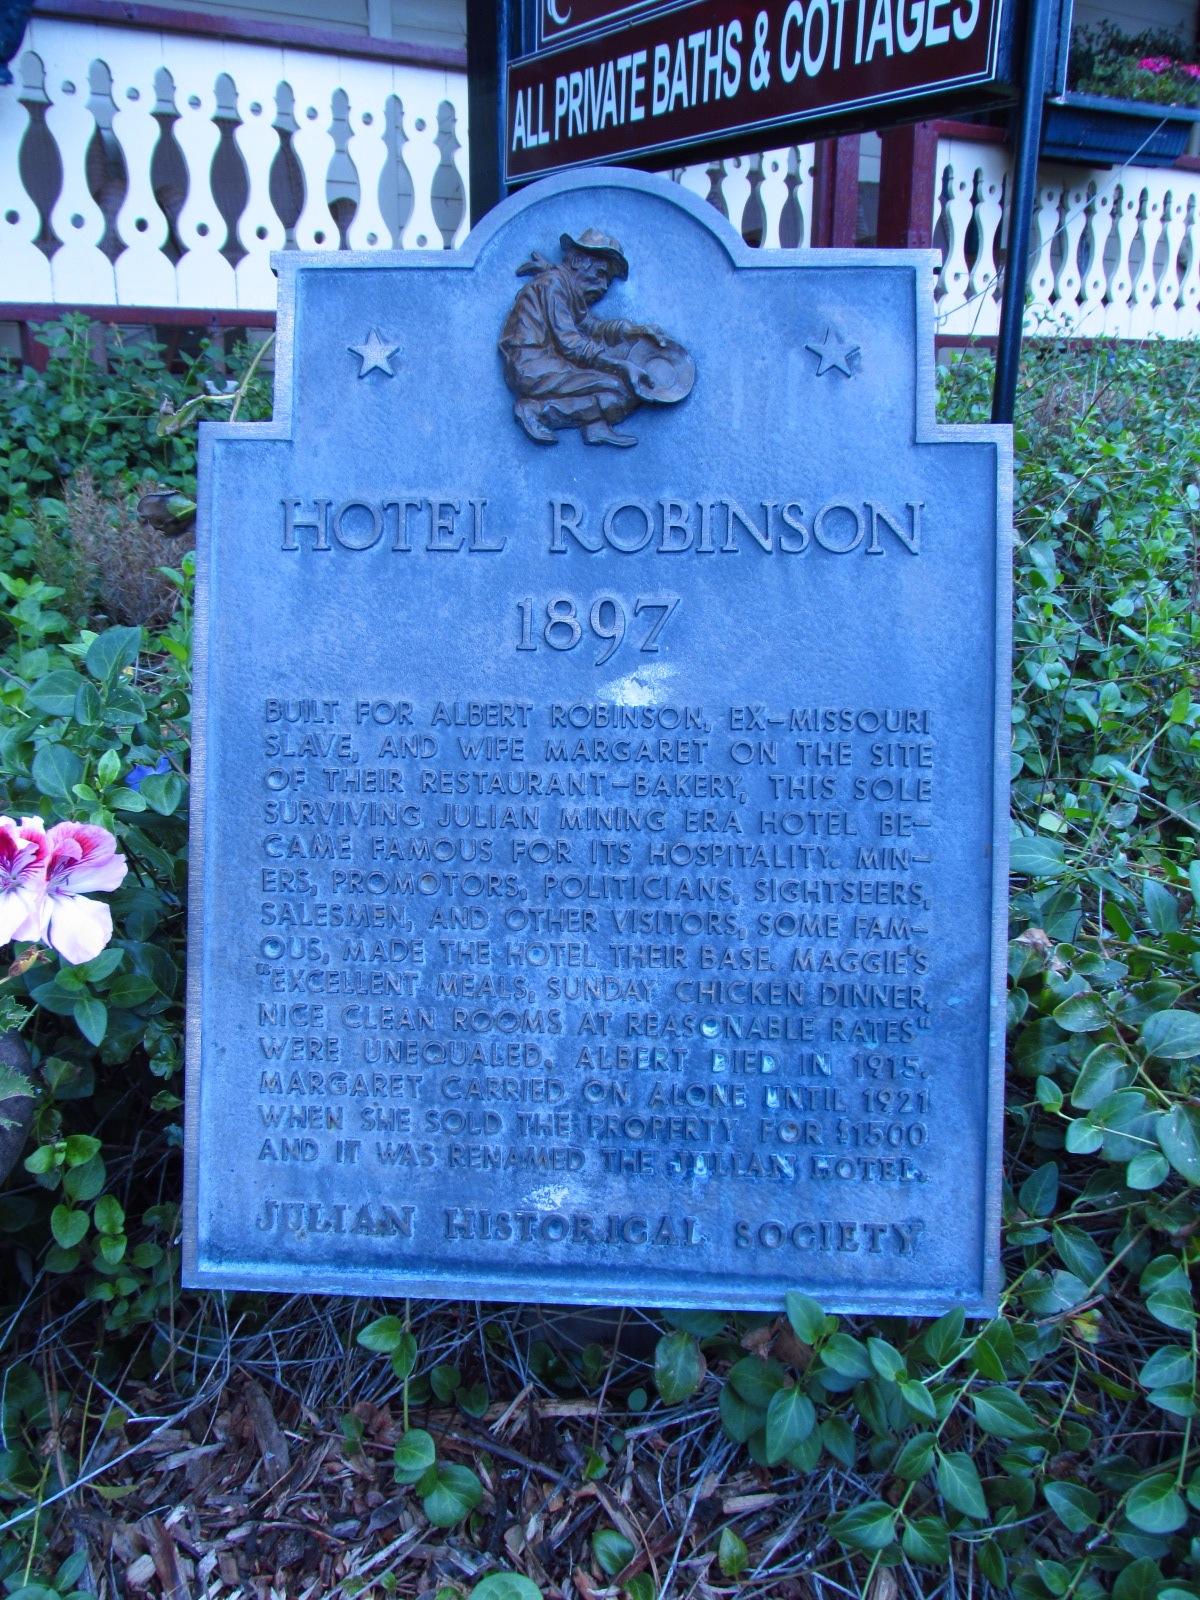 Julian Historical Society Hotel Robinson Sign